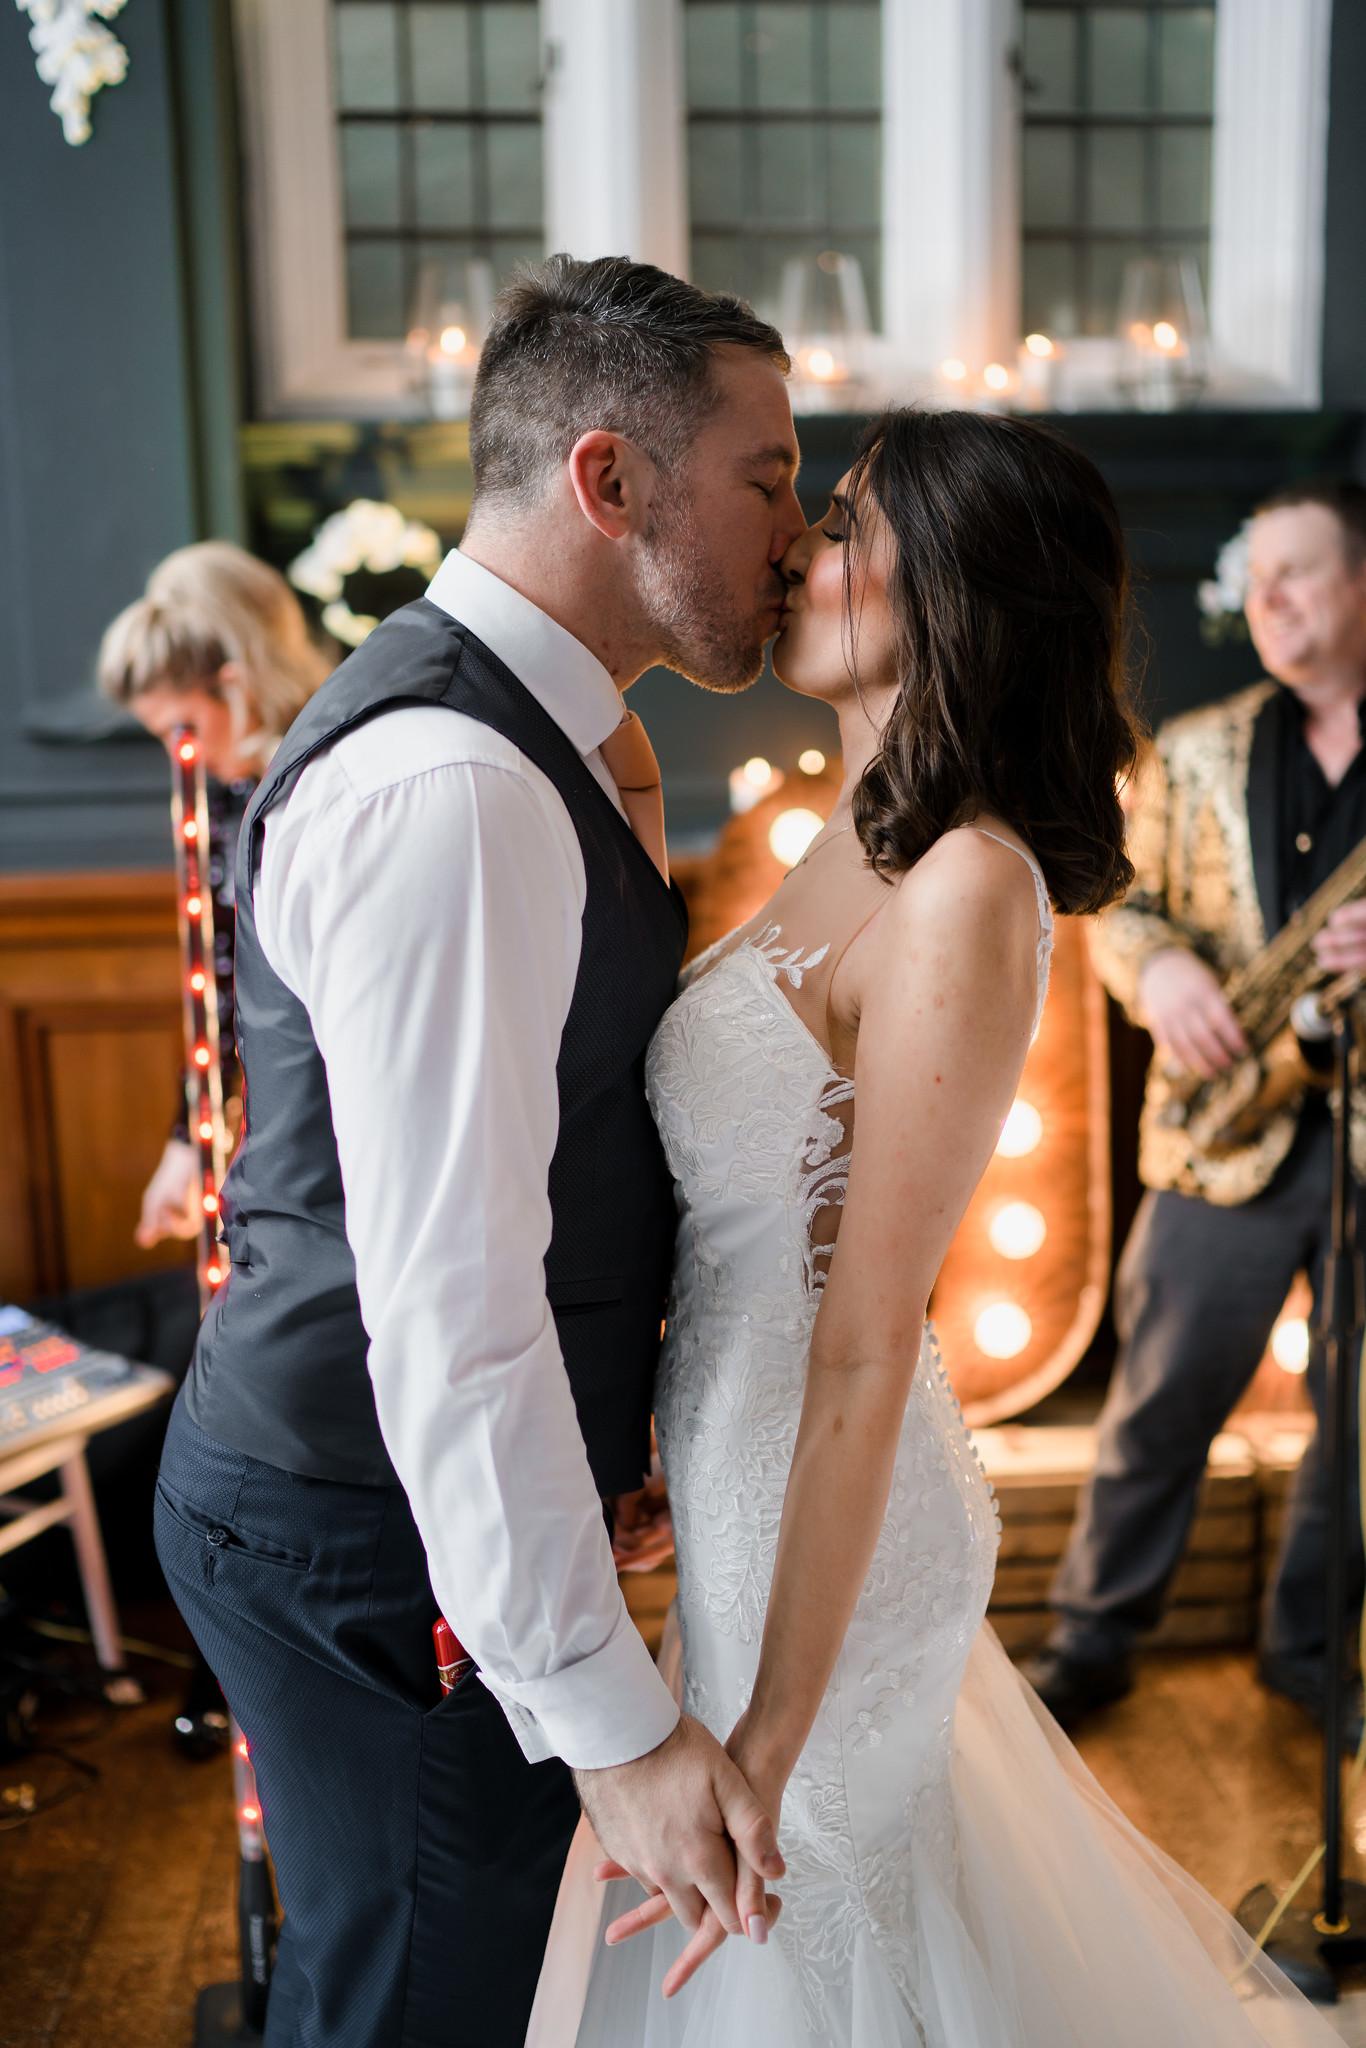 Bride and groom kiss on the dance floor